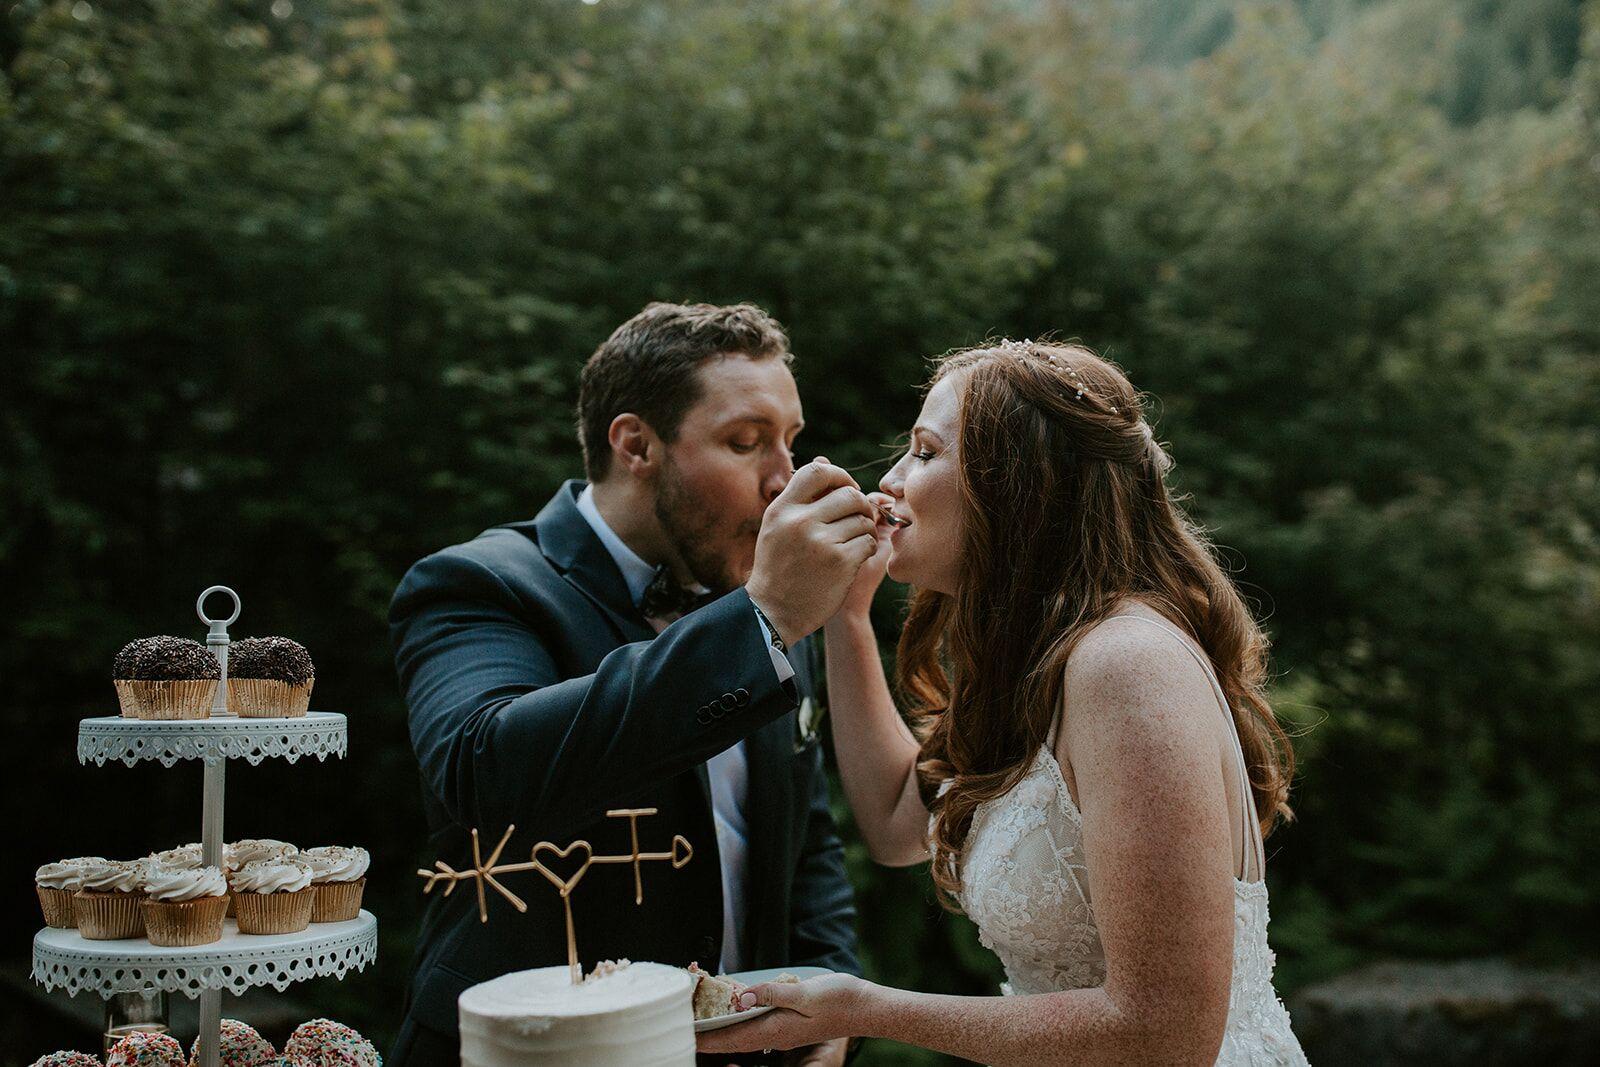 Blue-Sky-Ranch-Wedding-Block-Weddings-and-Events33.jpeg